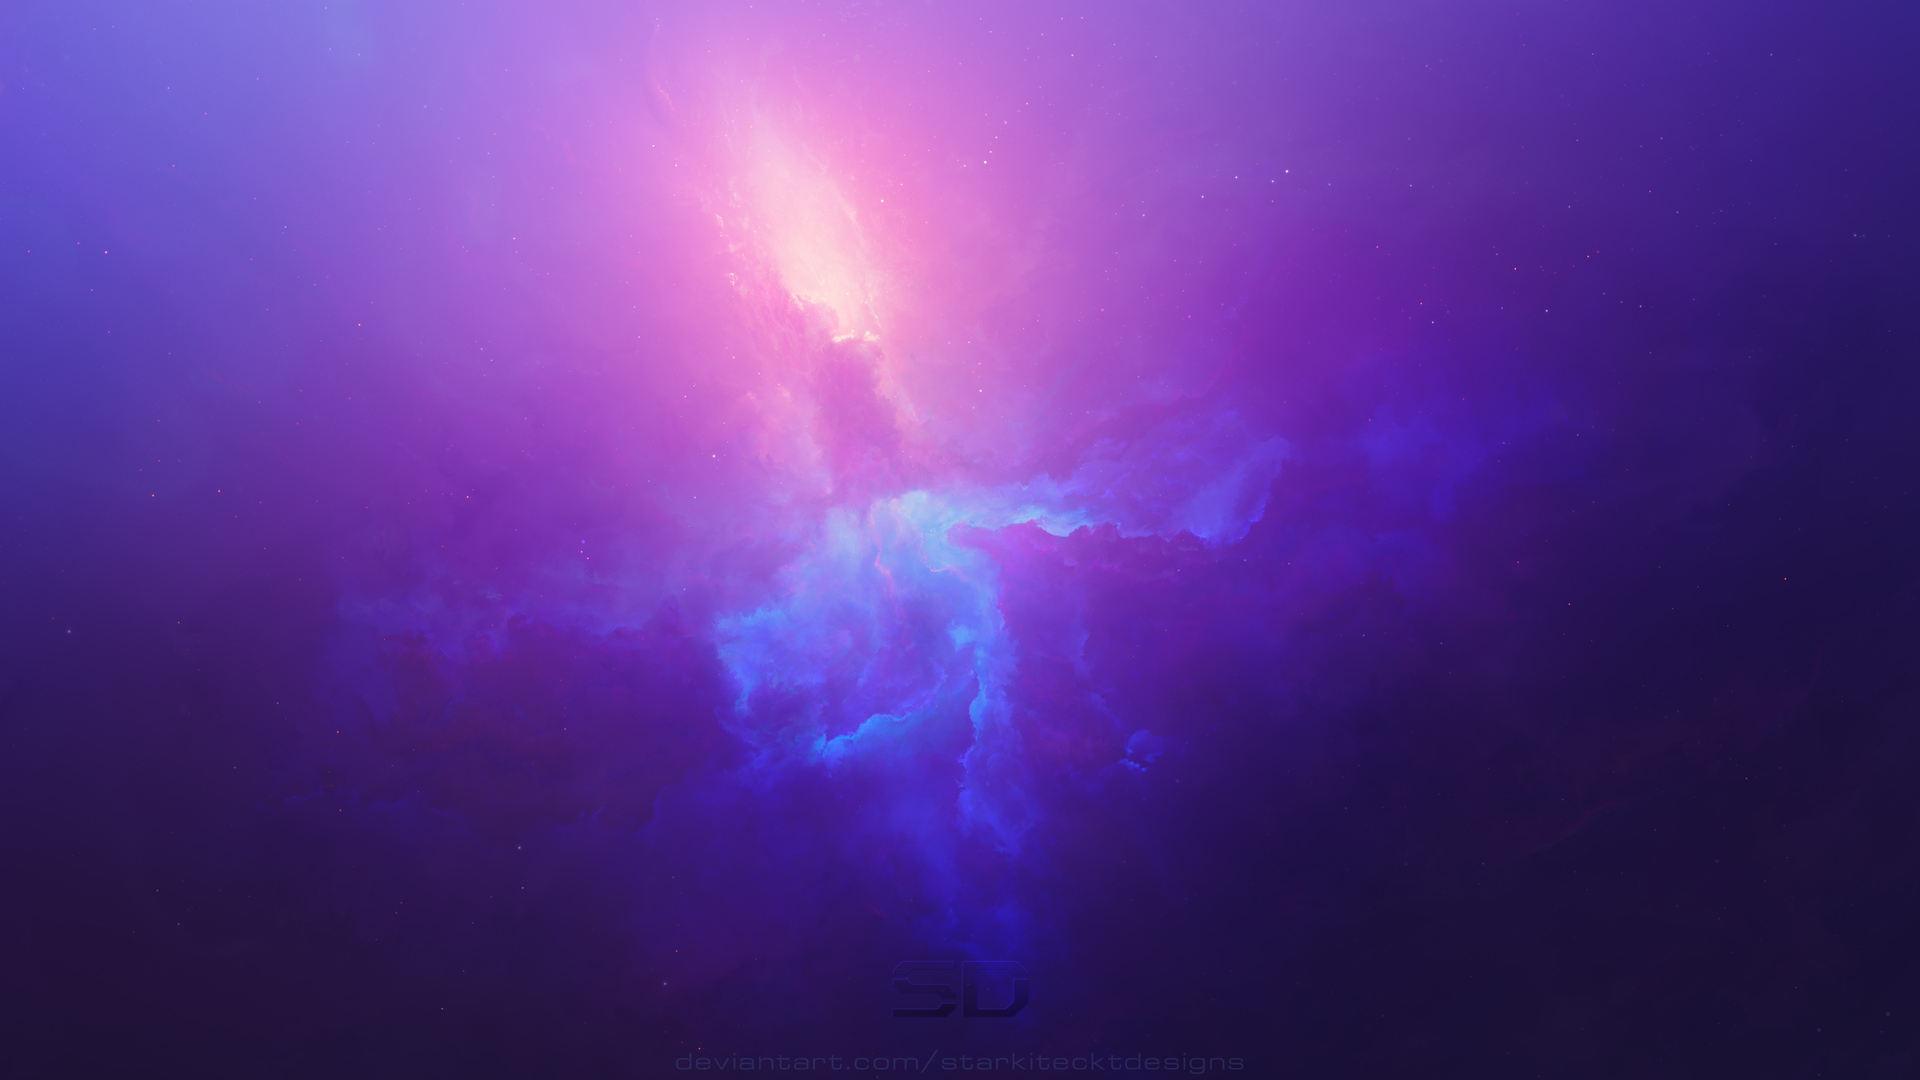 cosmos series download 1080p